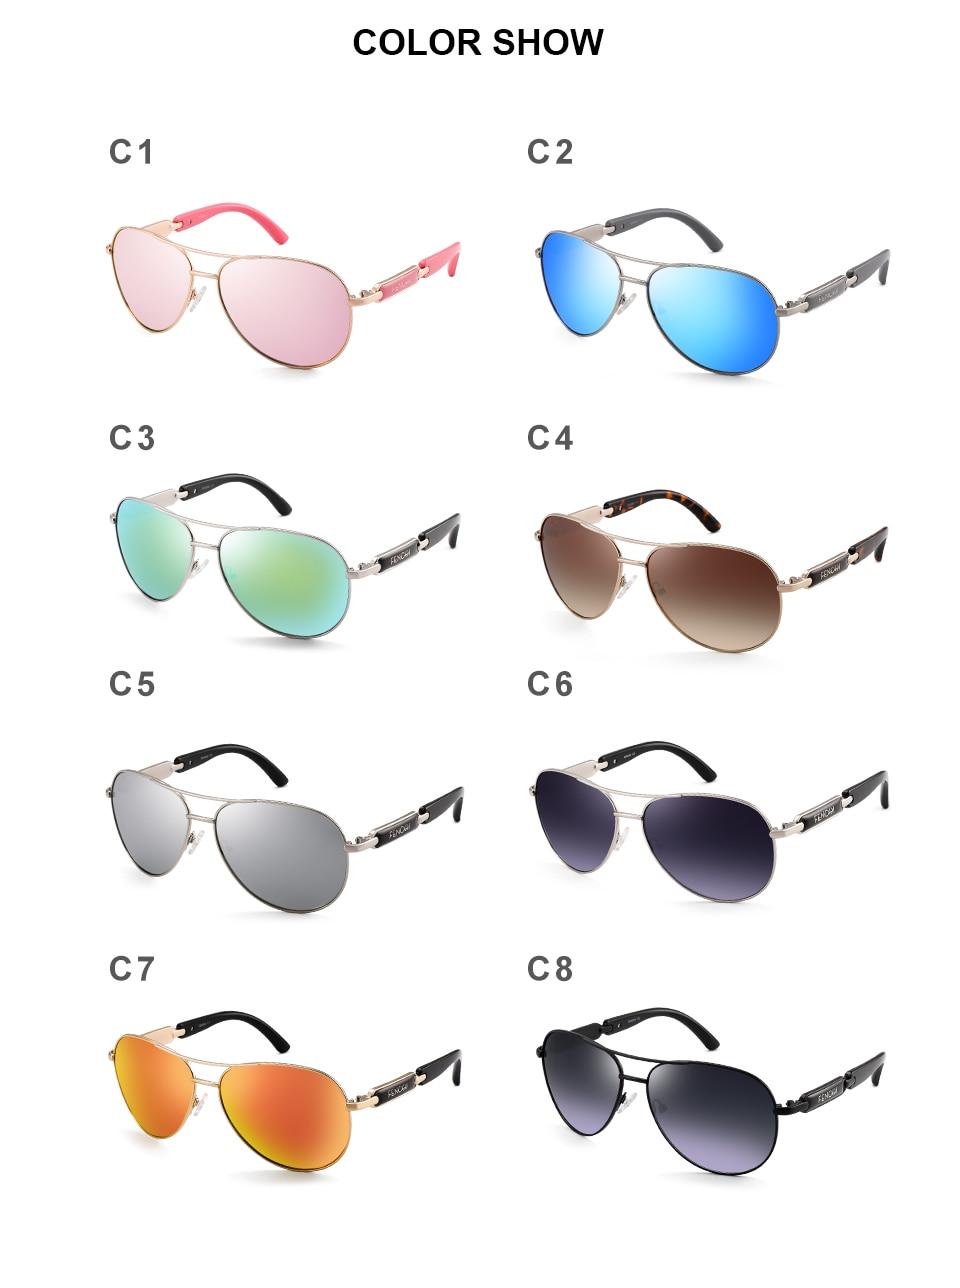 Hb28b7c74ae384fc5967e78a578f5fc3dw FENCHI Polarized Sunglasses Women Vintage Brand Glasses Driving Pilot Pink Mirror sunglasses Men ladies oculos de sol feminino